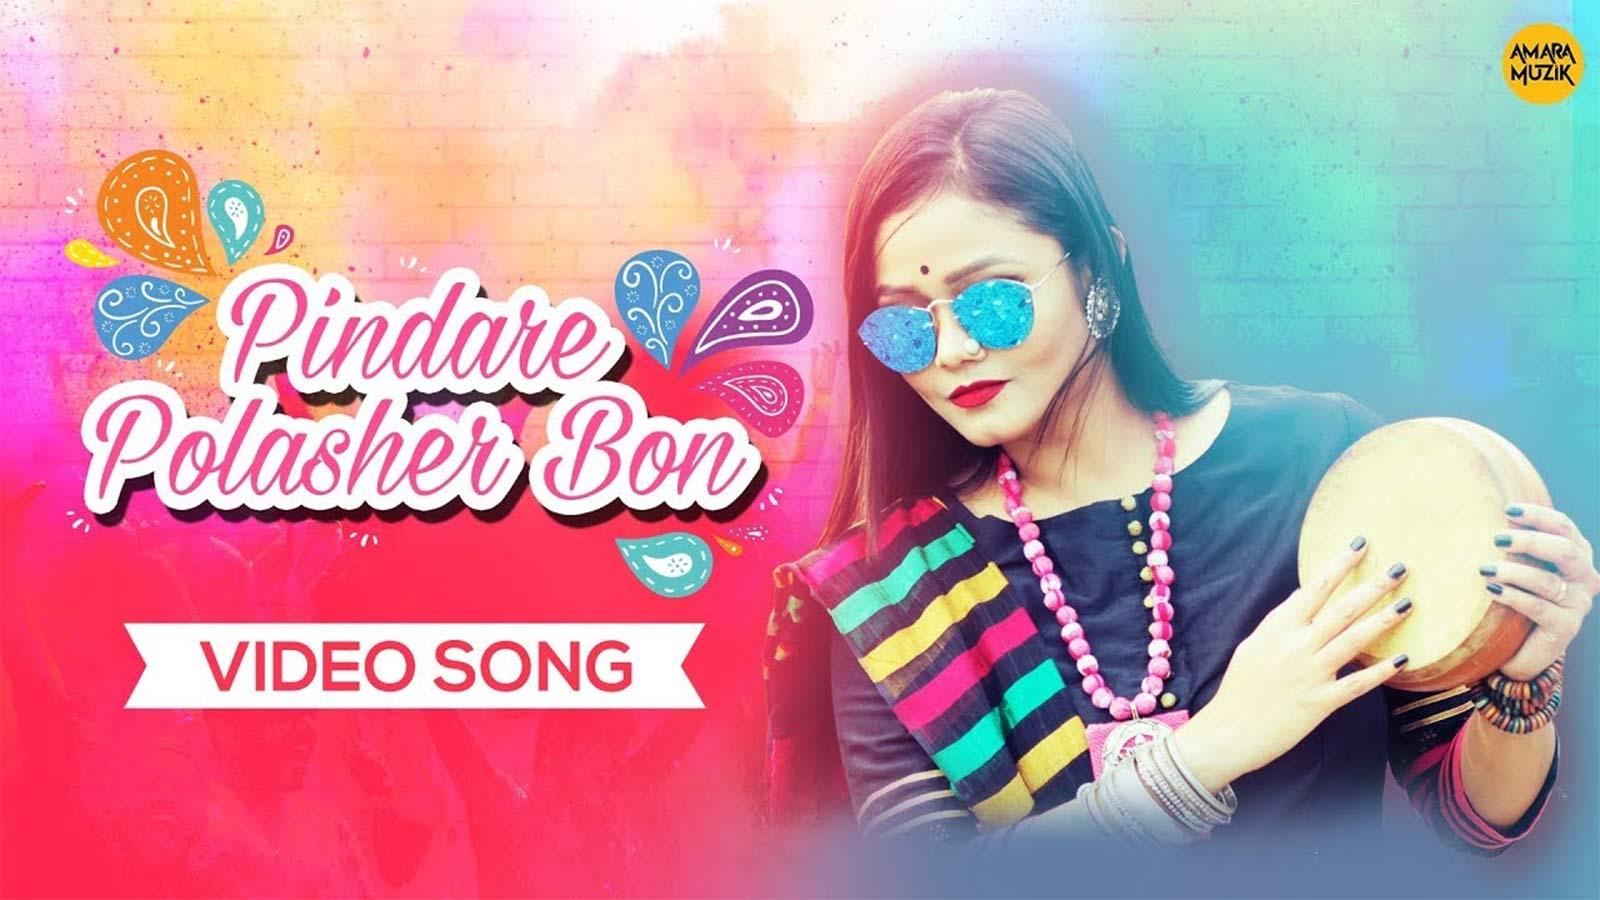 Latest Bengali Song 'Pindare Polasher Bon' Sung By Shreya Chakraborty